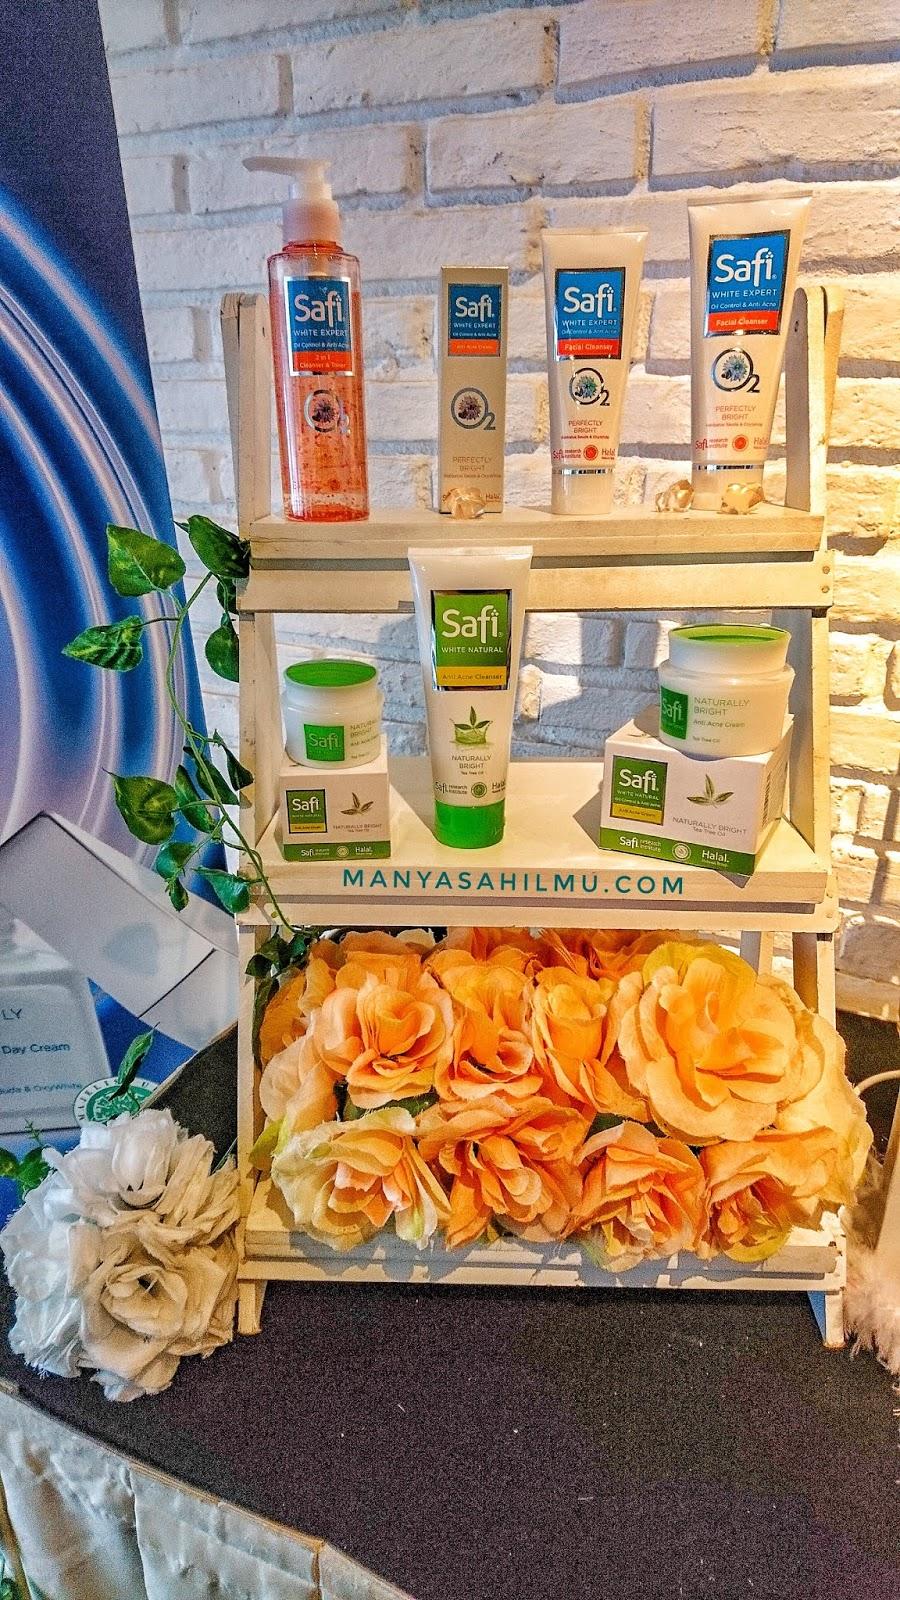 Launching Safi Oil Control Anti Acne Series Plus Review Di Safi Blogger Gathering Manyasah Ilmu